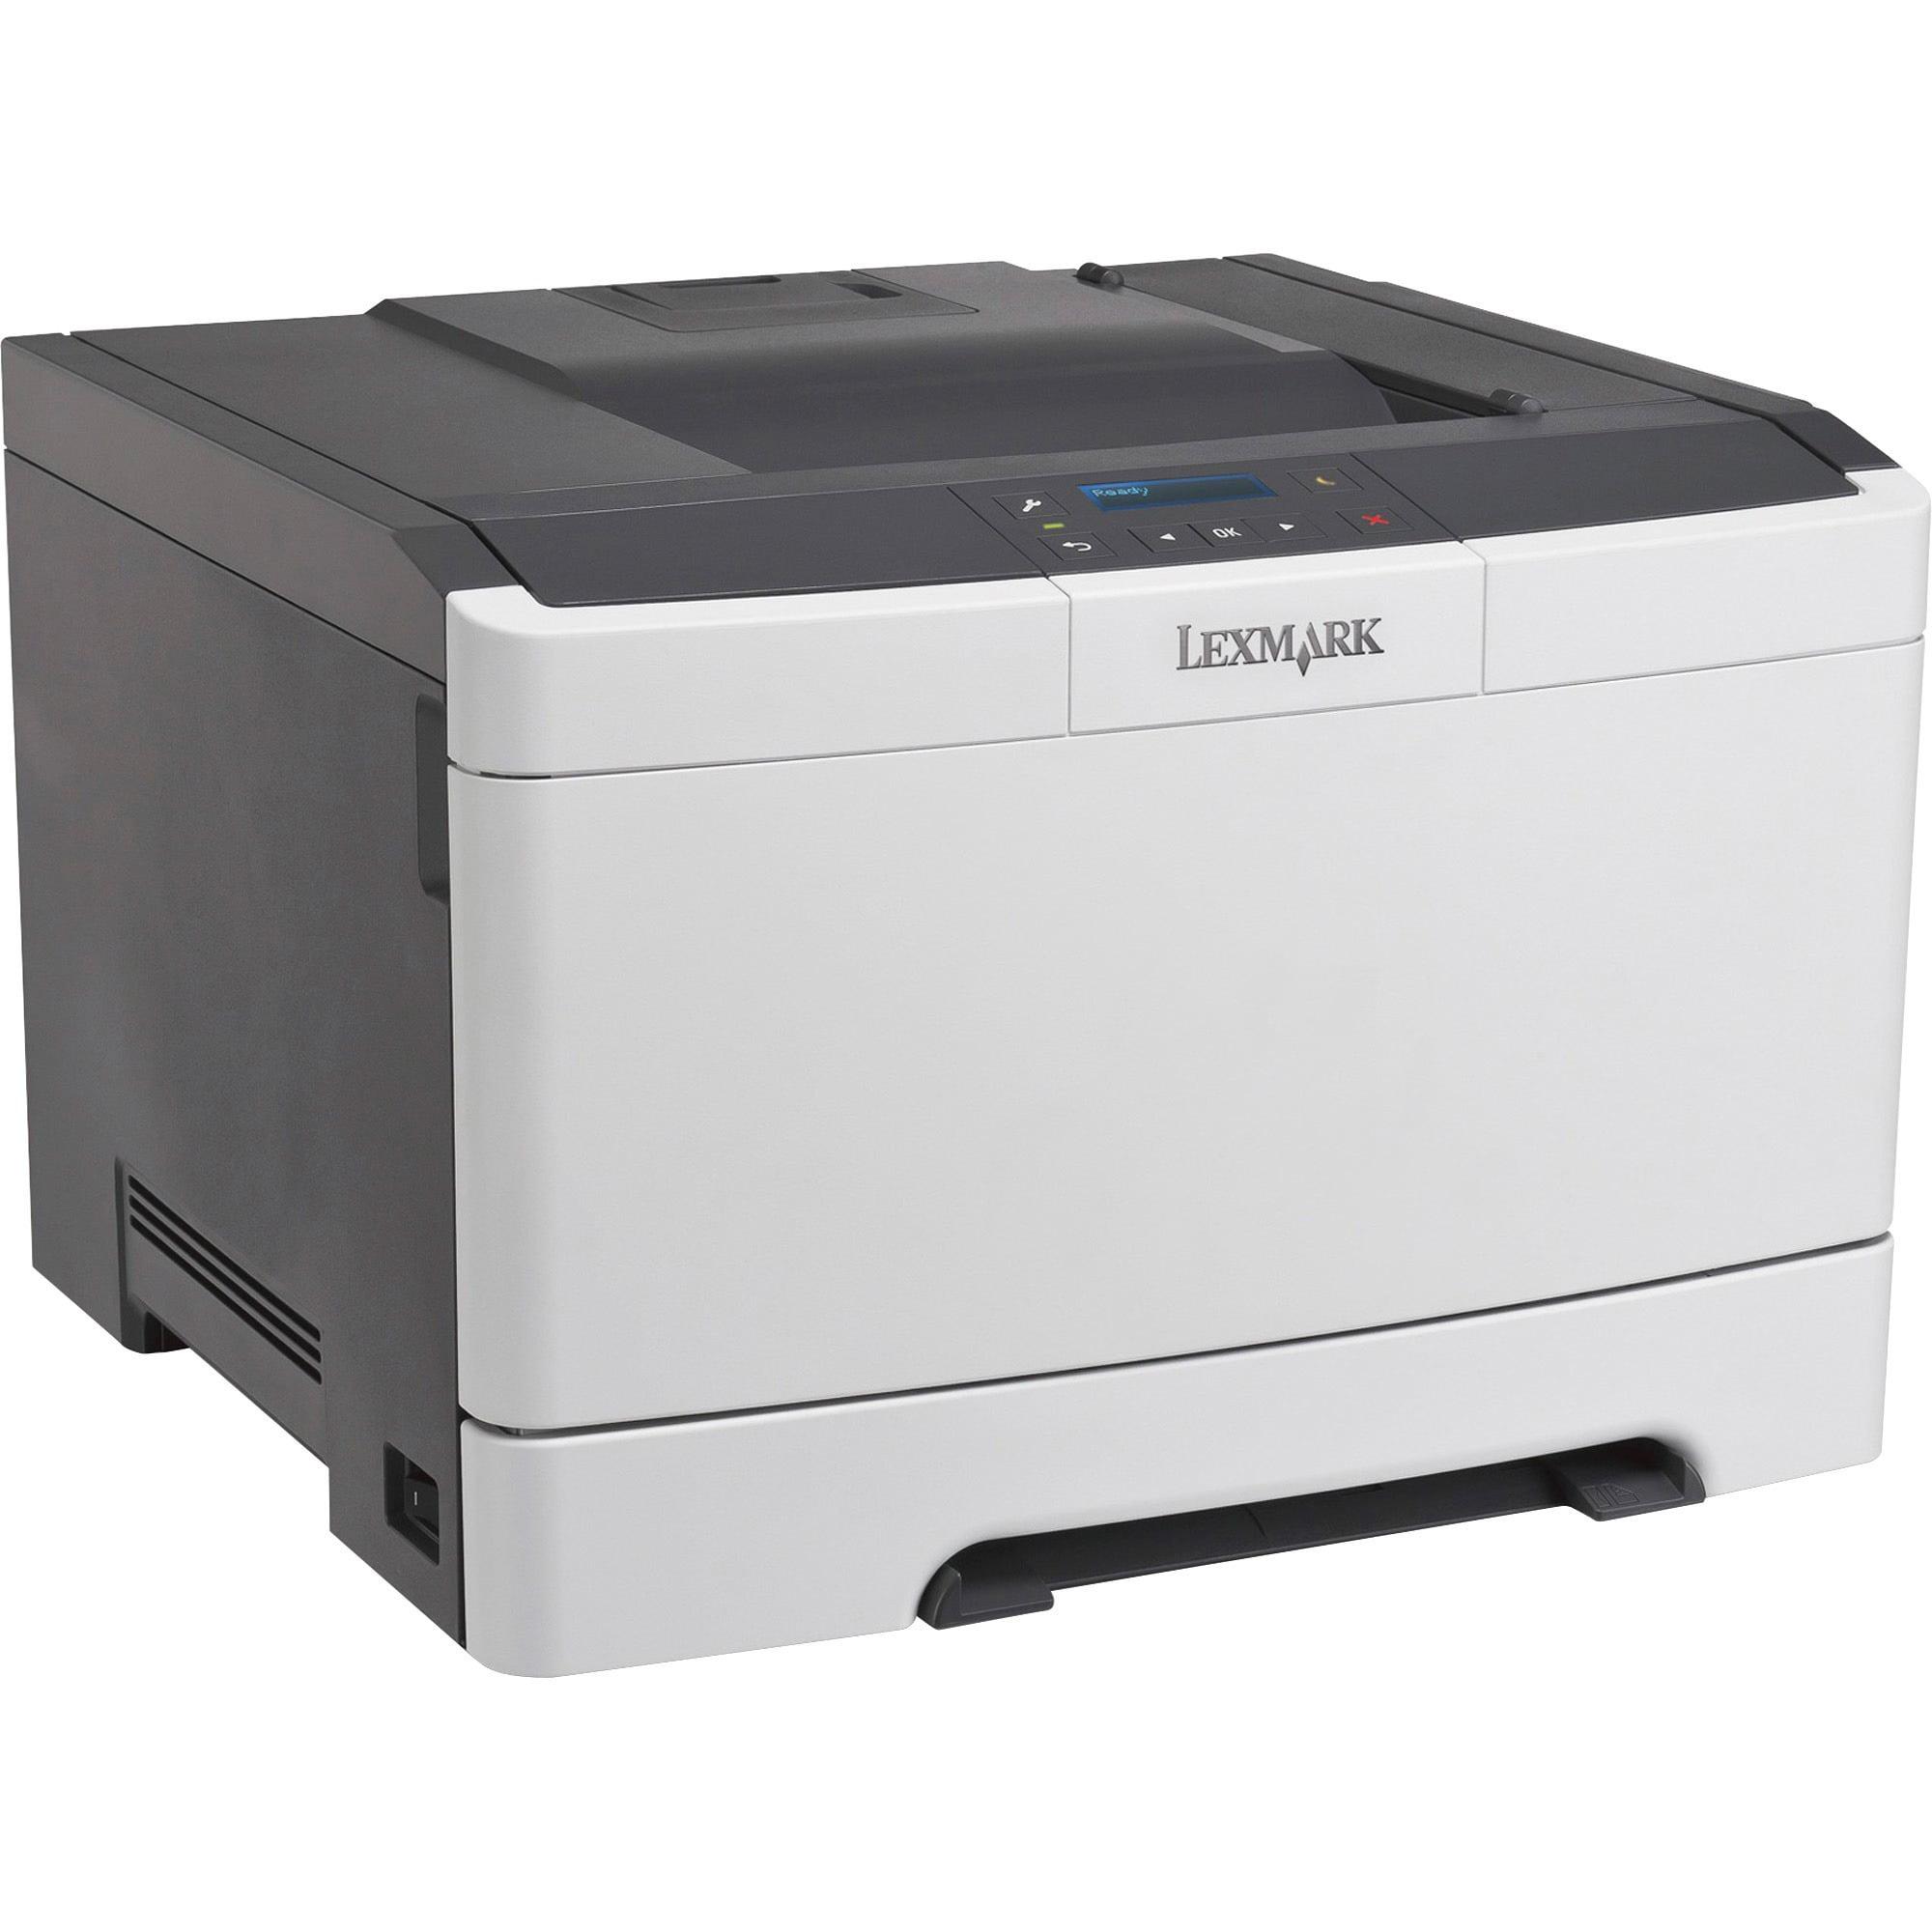 Lexmark, LEX28C0000, CS310n Network-ready Color Laser Printer, 1 Each, Black,Gray